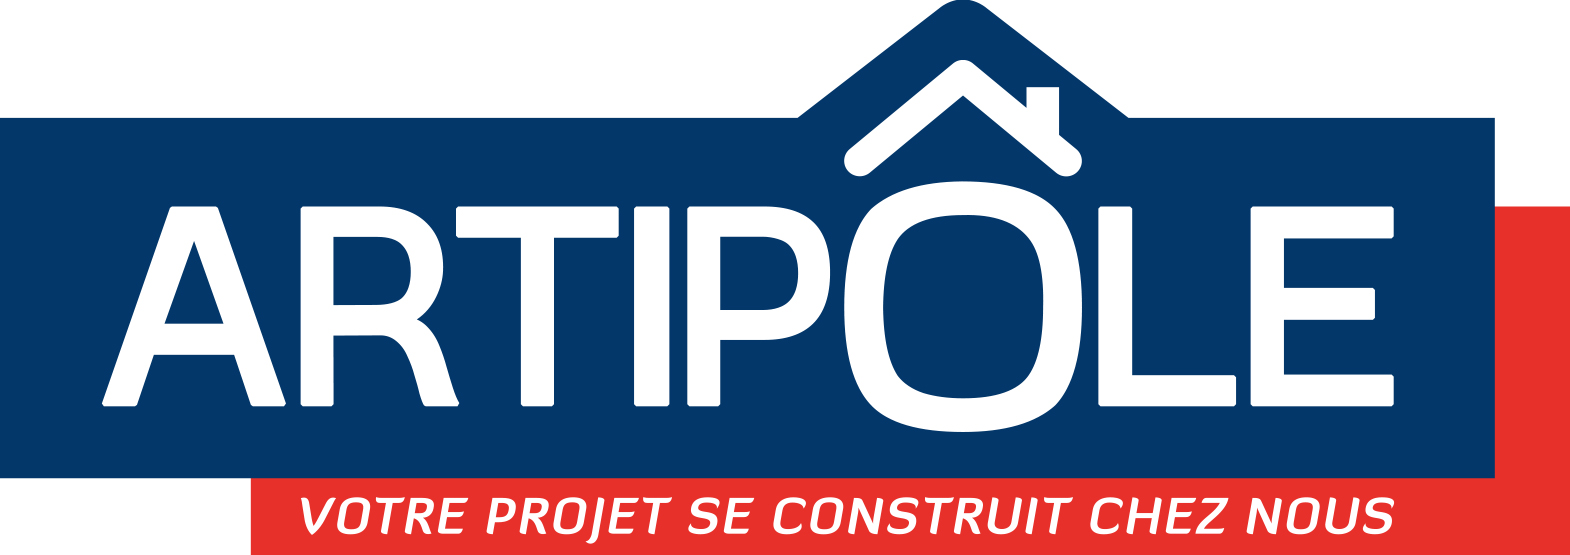 Artipole Vannes - AG Confort Plombier Vannes - Saint Nolff